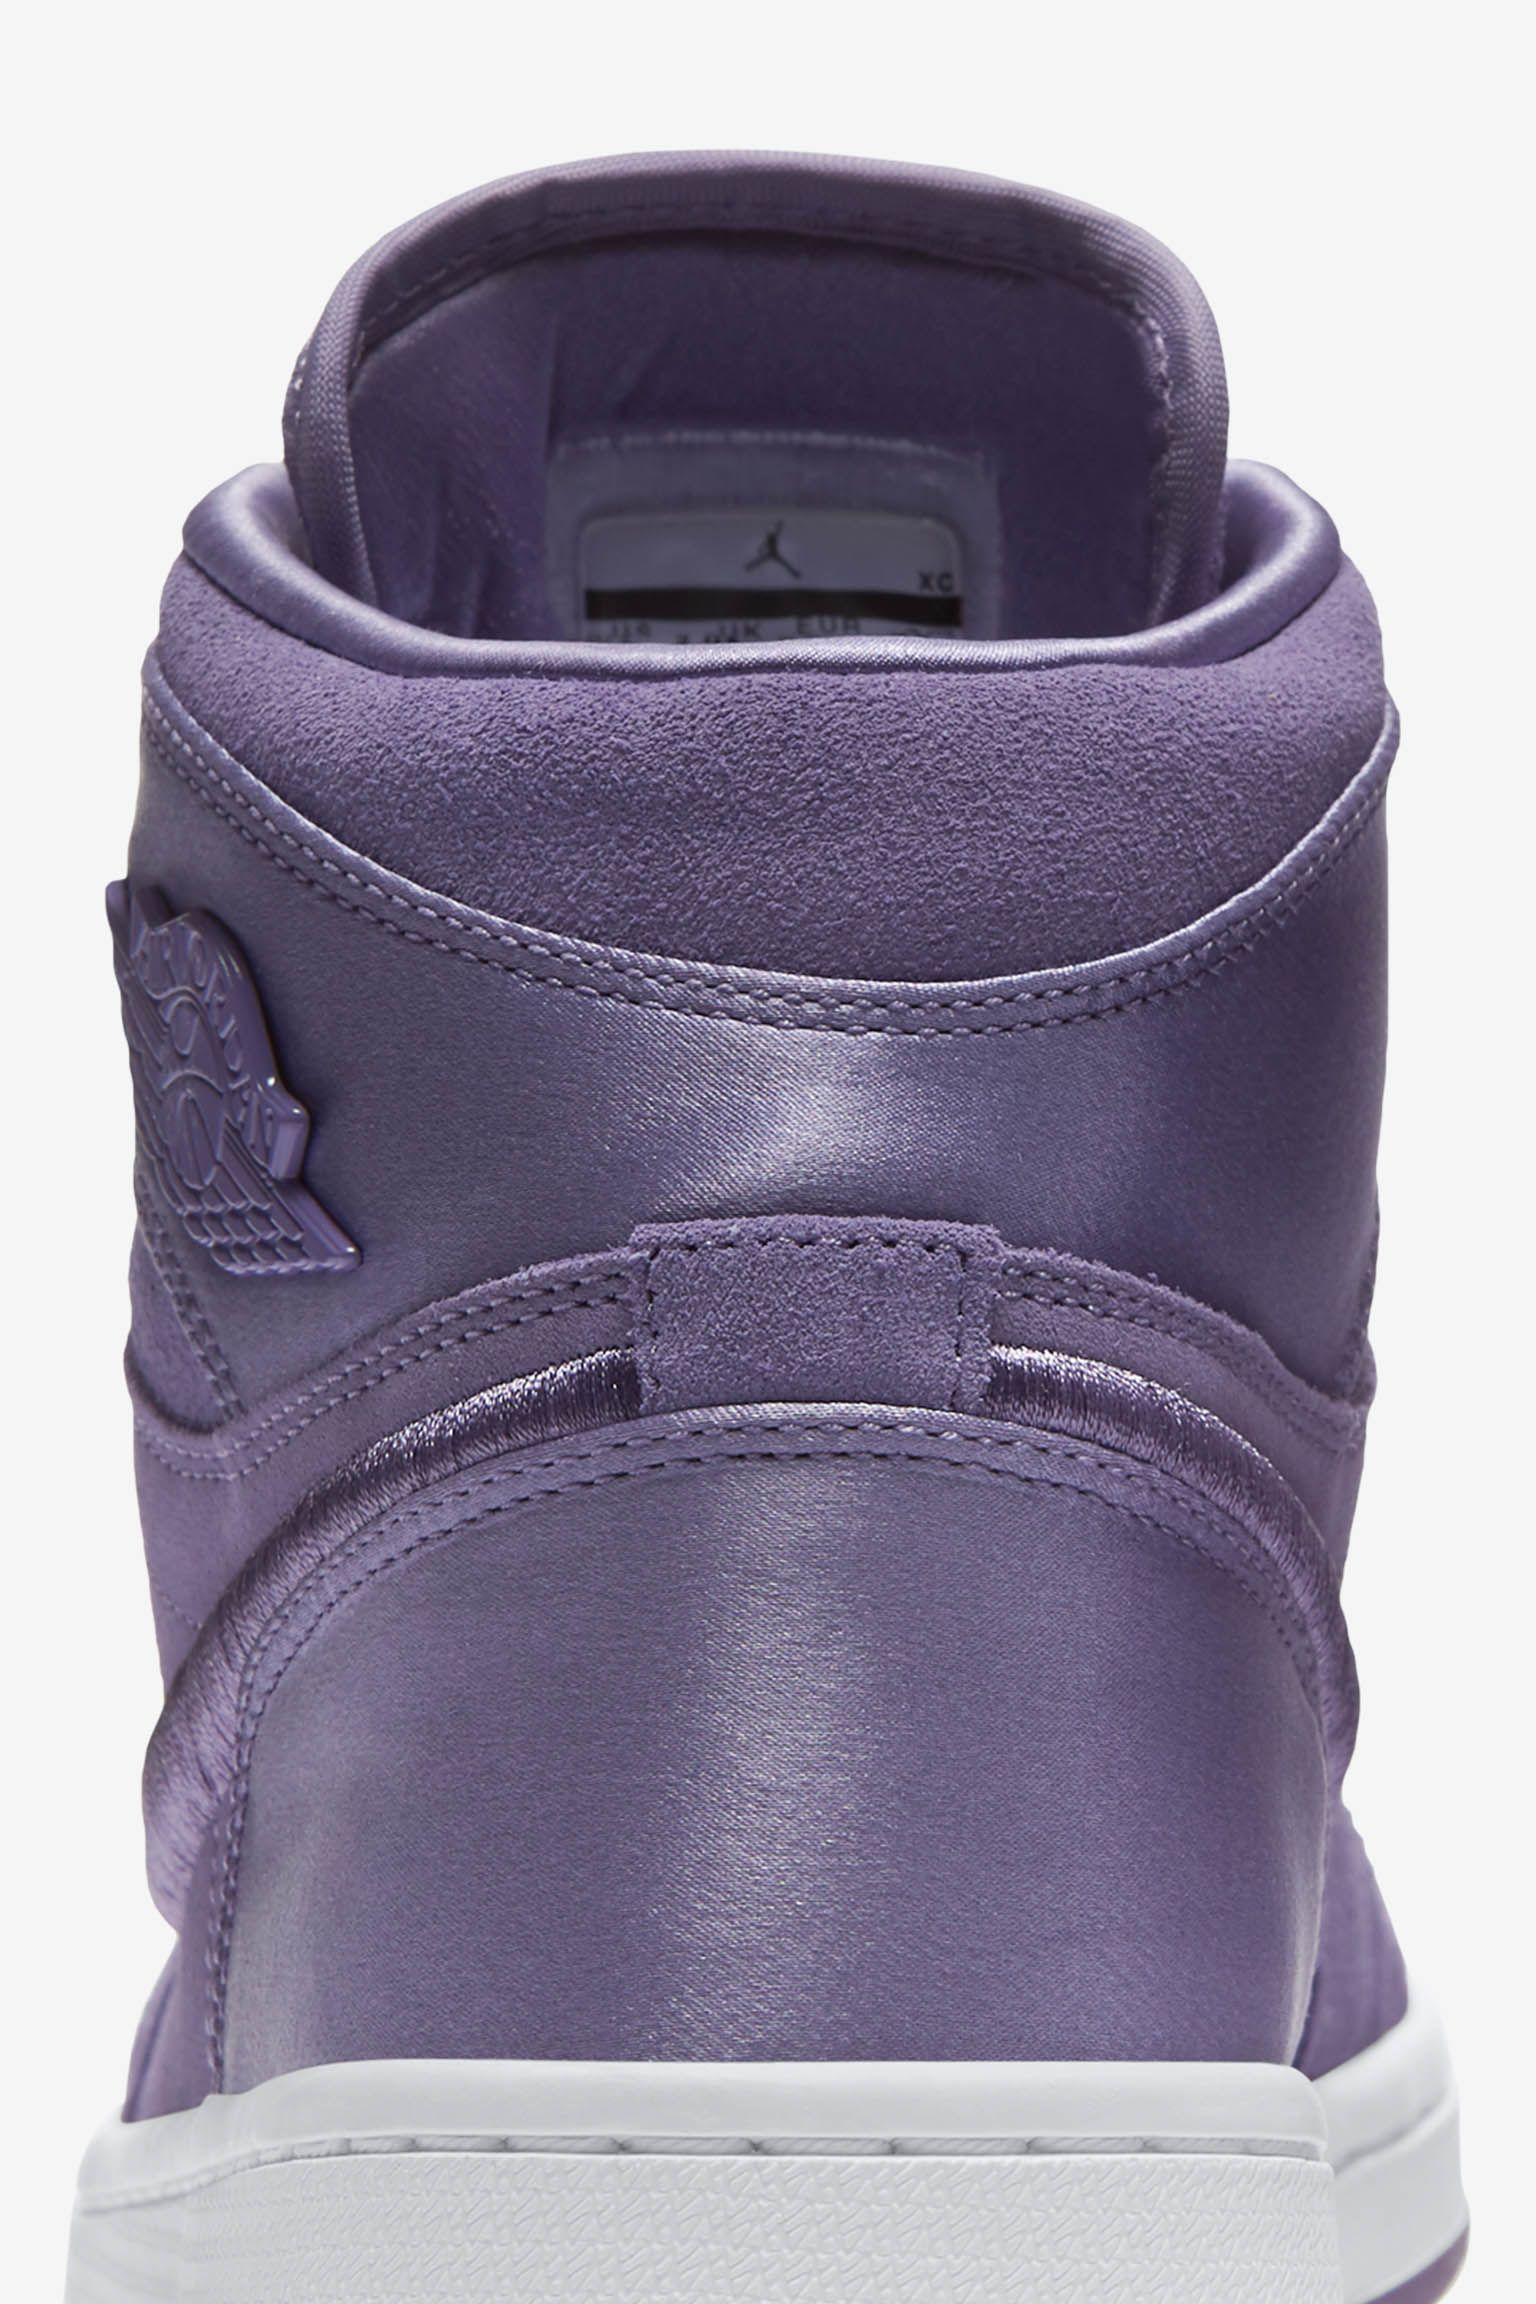 Women's Air Jordan 1 Retro High 'Purple Earth' Release Date